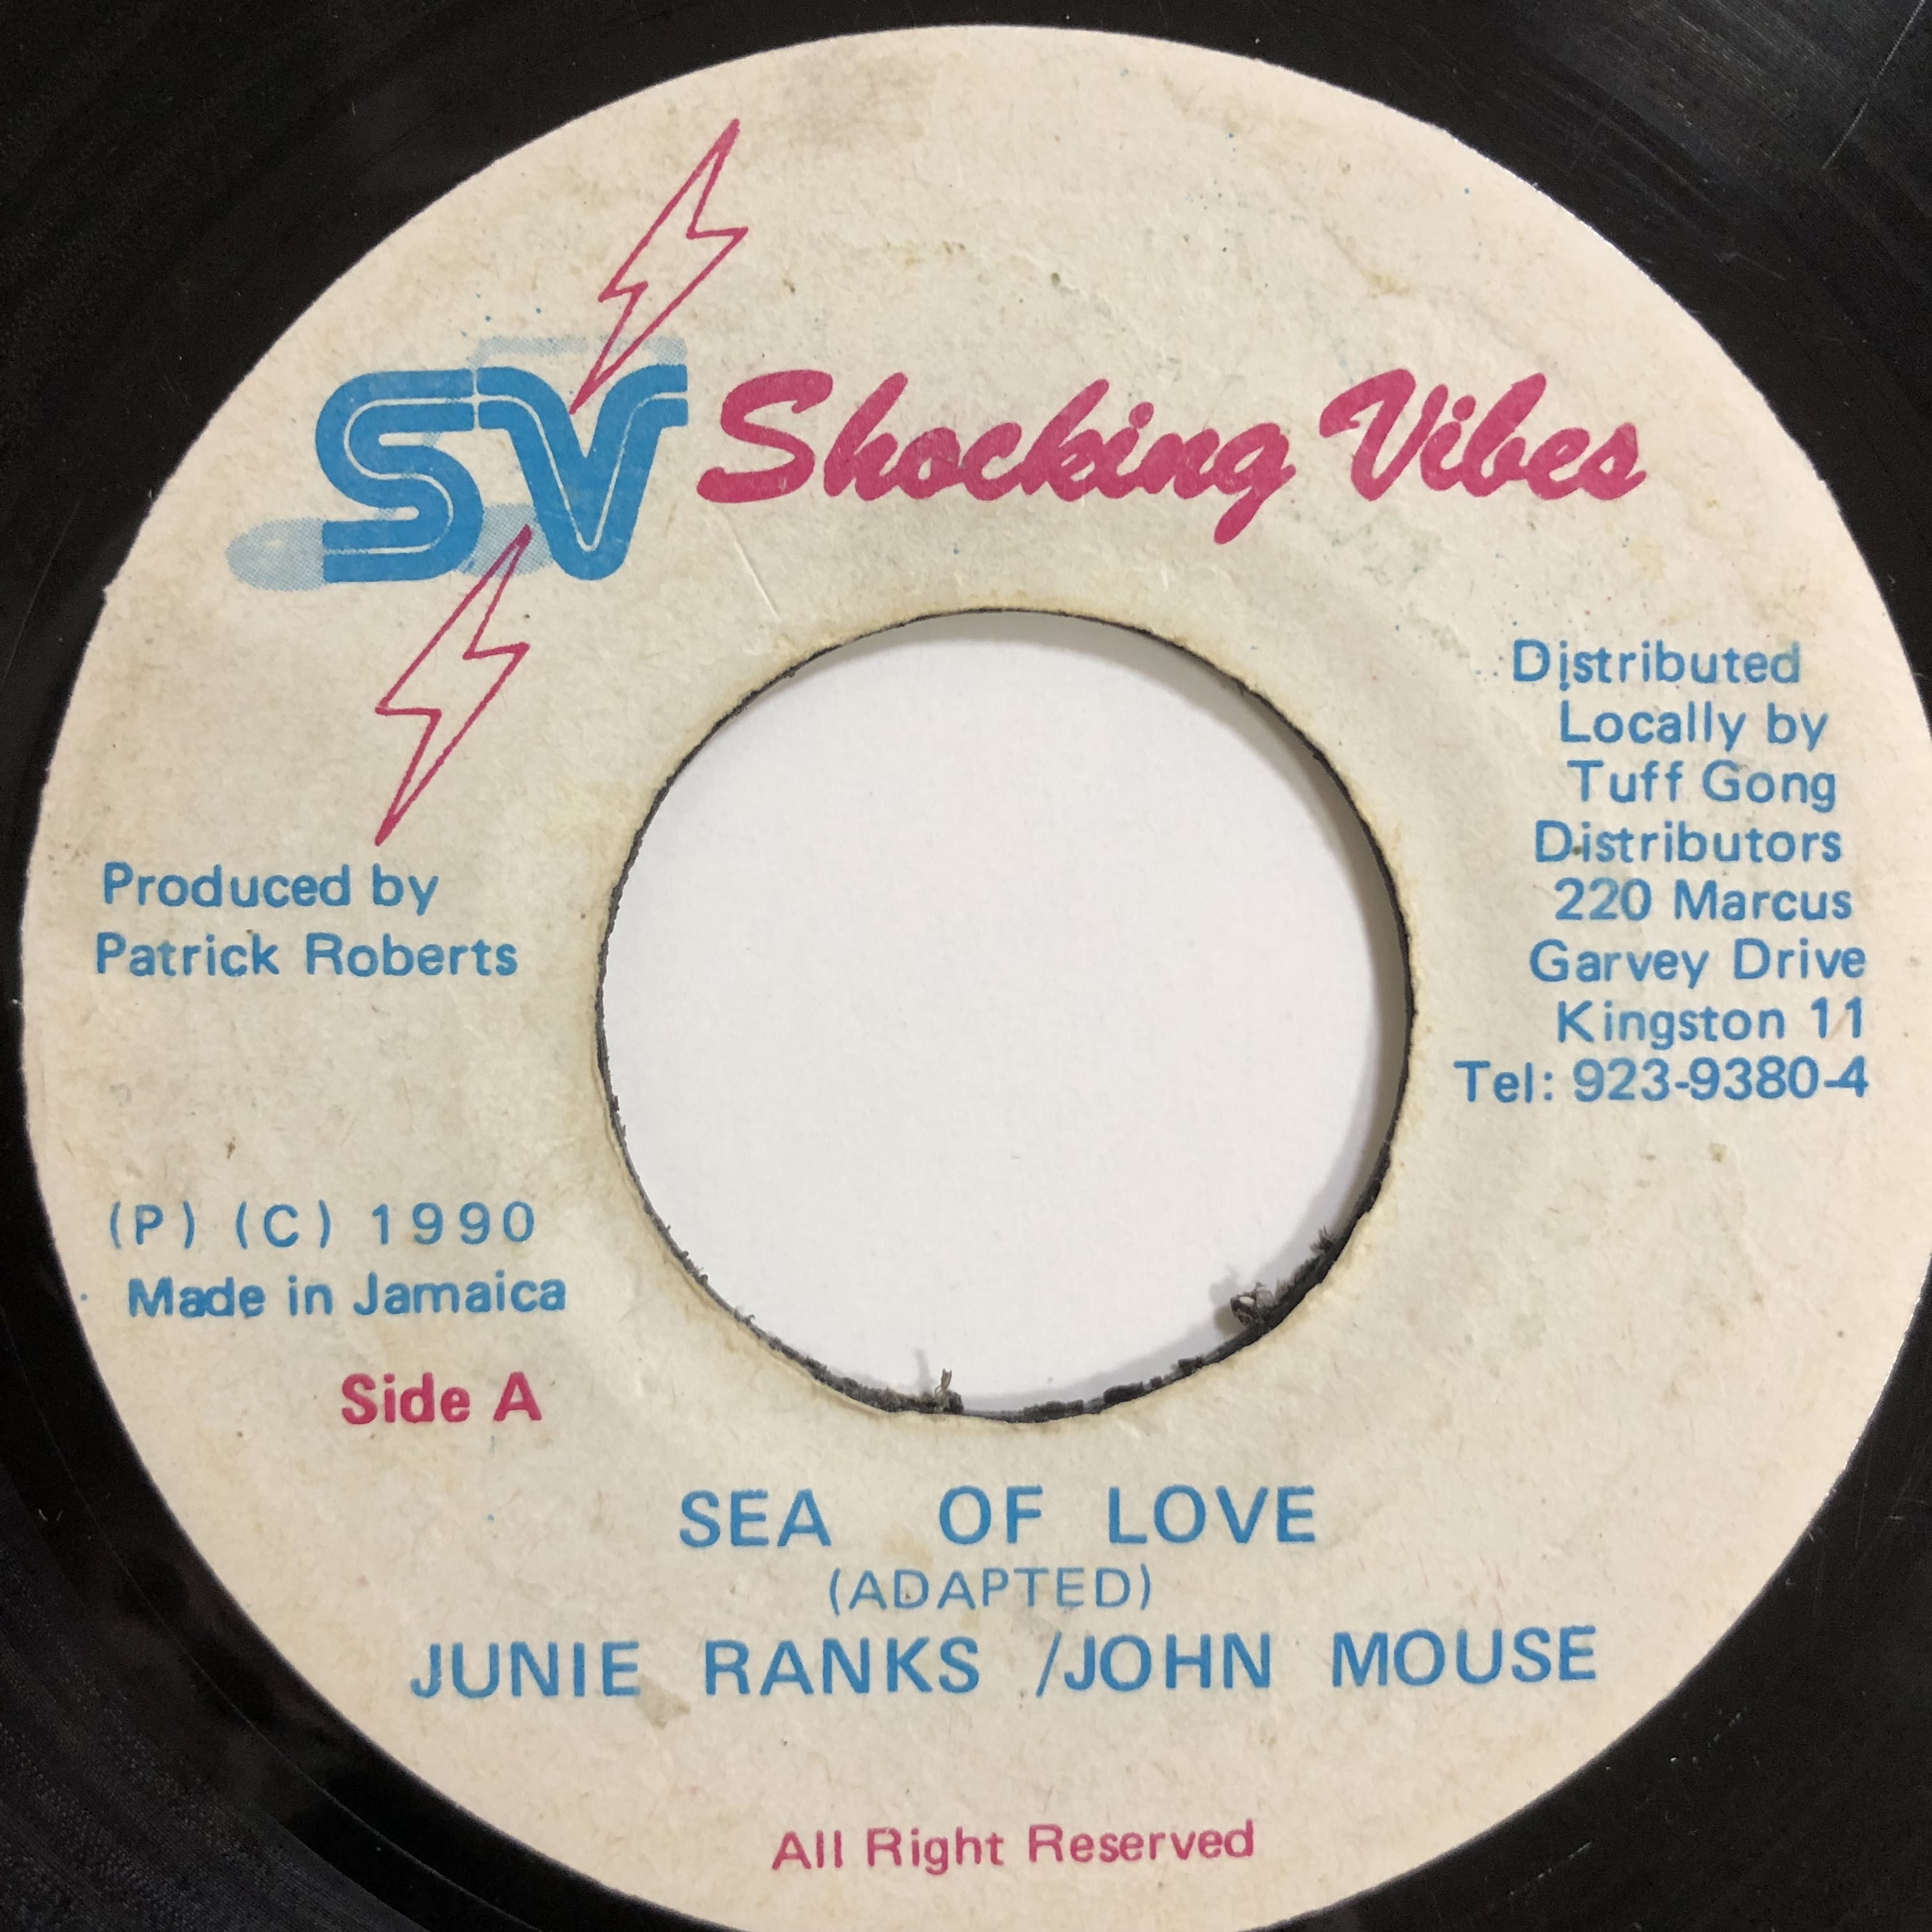 Junie Ranks & John Mouse - Sea Of Love 【7-20130】